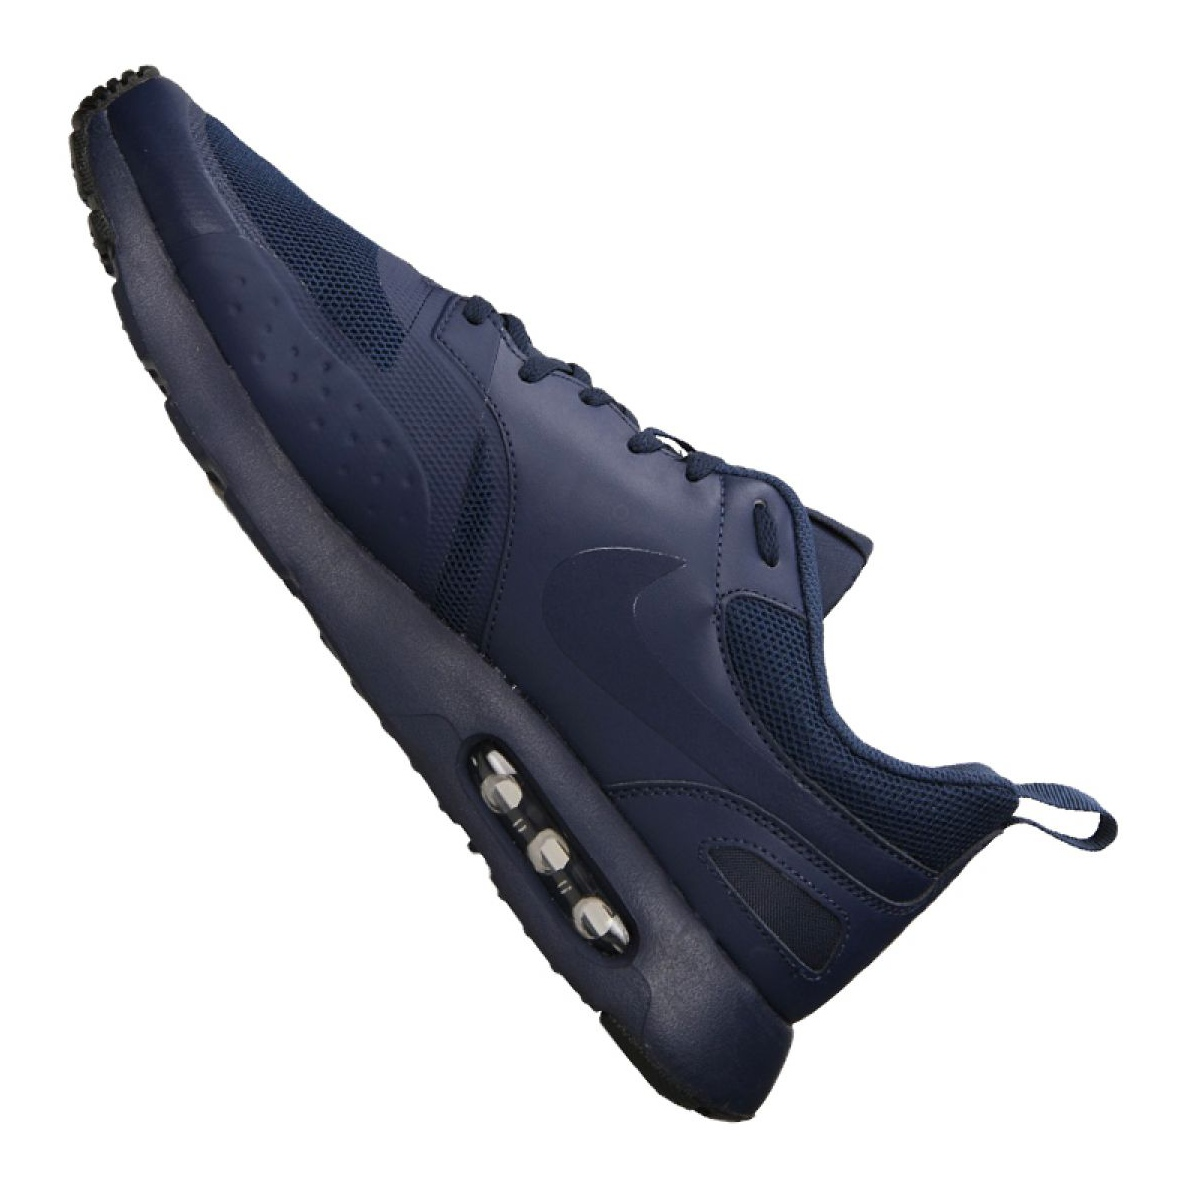 marine Air chaussures 401 Max 918230 M Détails Vision Nike sur Lj5RA34